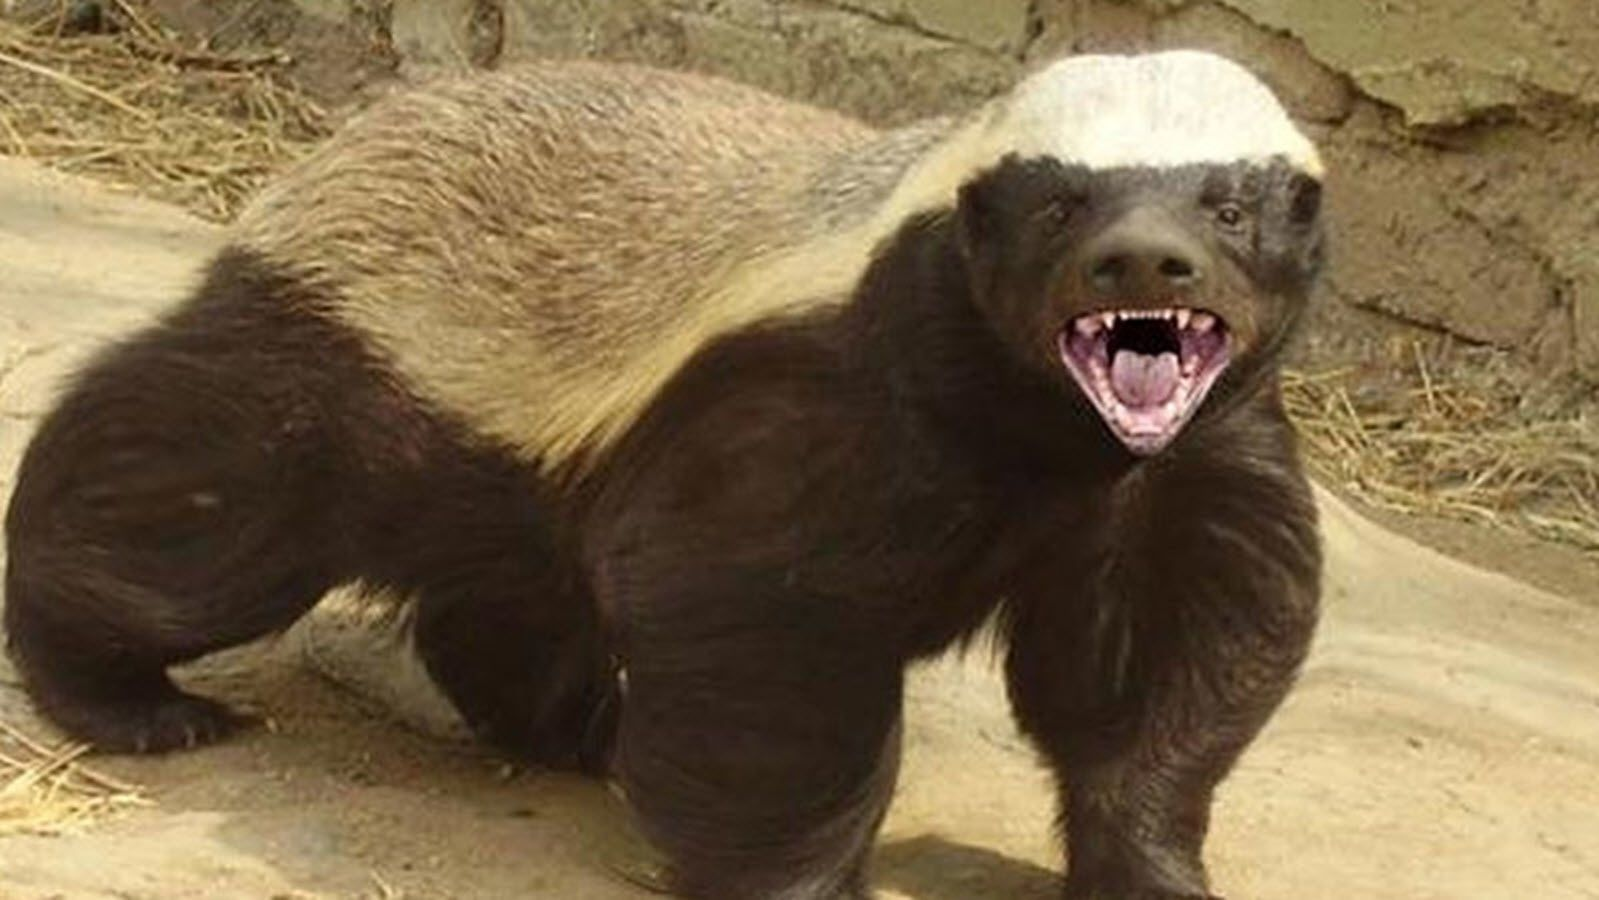 Randall the Honey Badger animal narrator, who became a viral meme